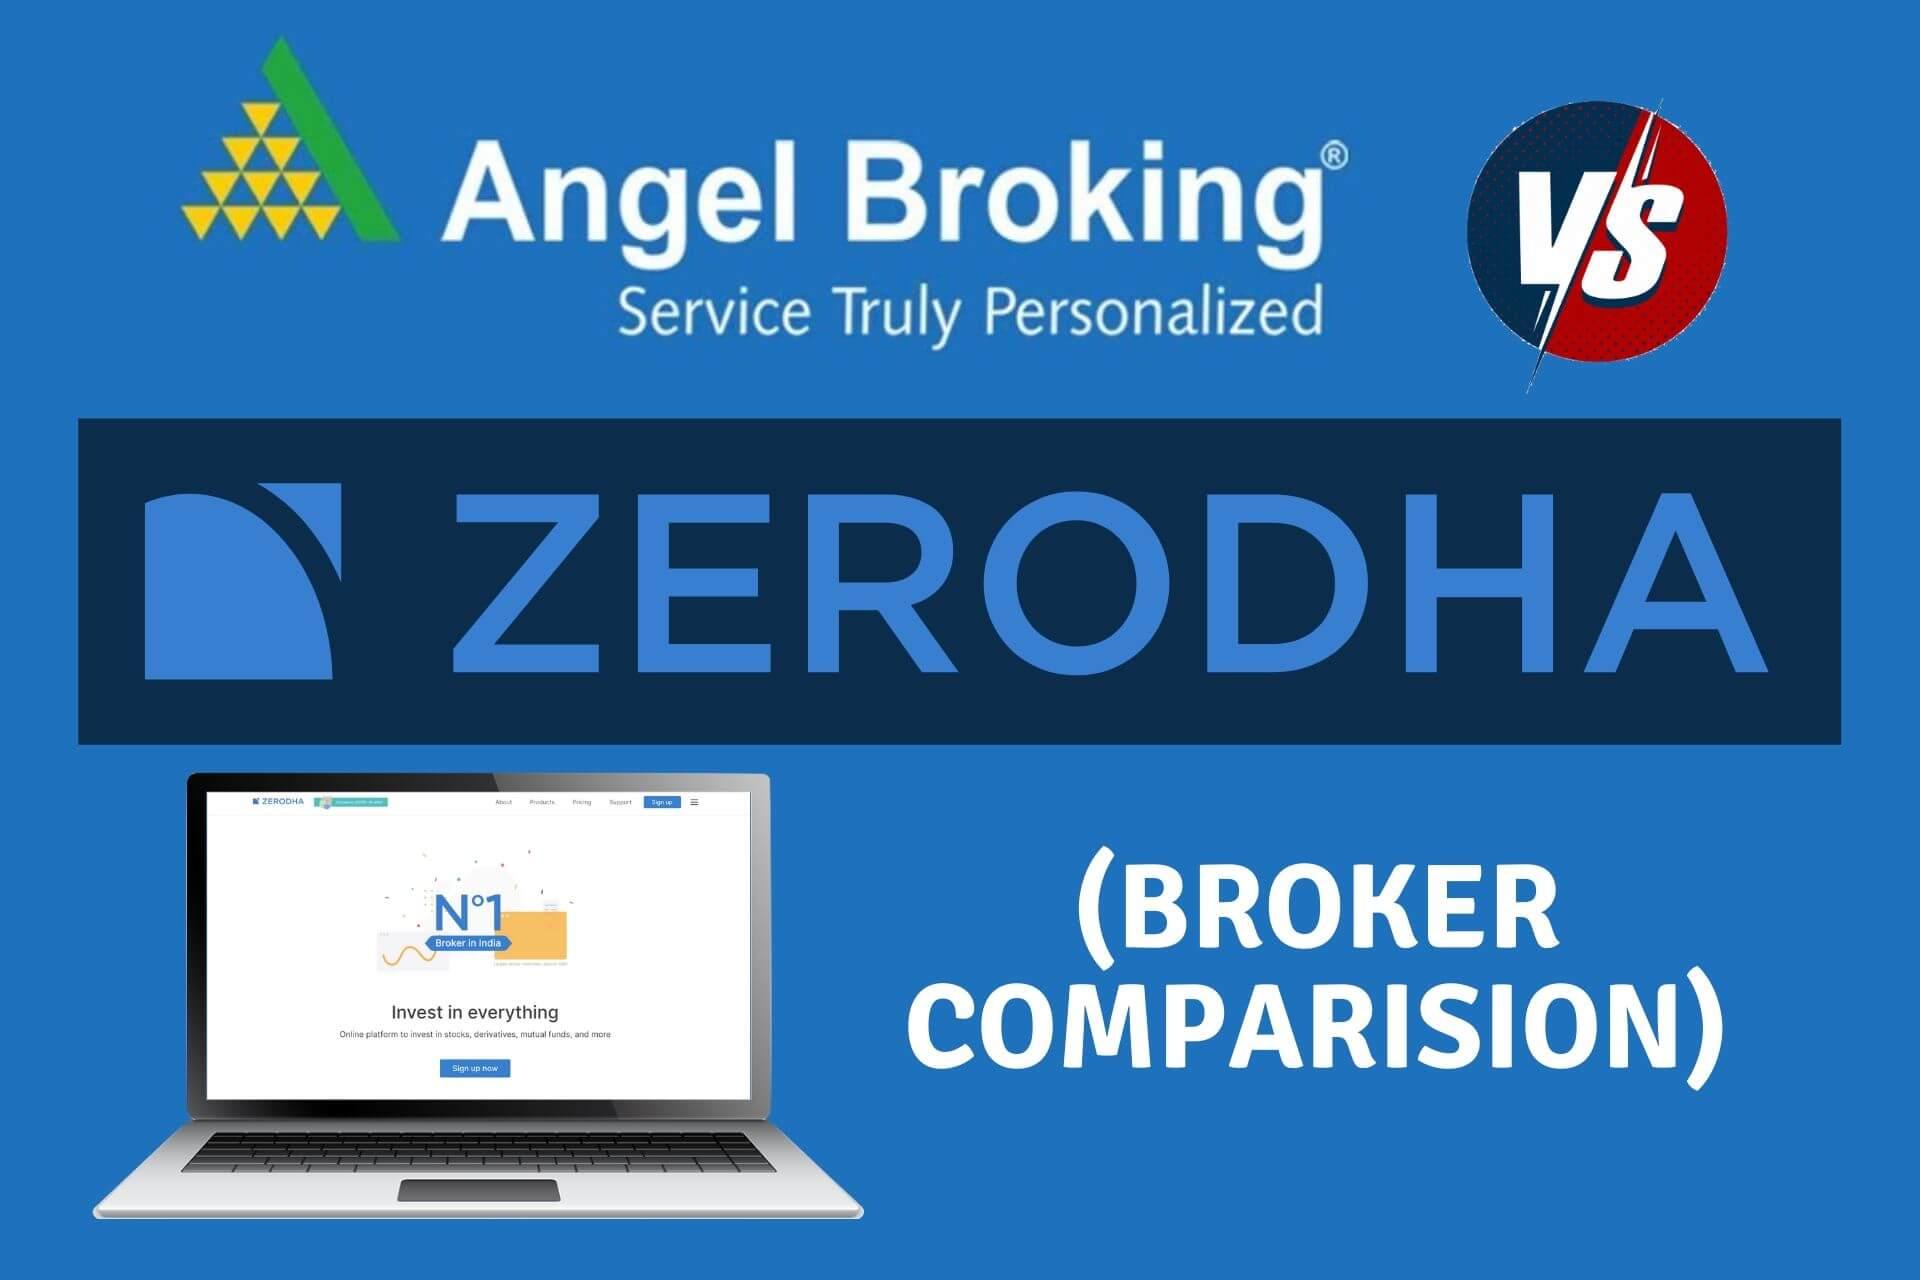 Zerodha vs Angel Broking: Stockbroker Comparison